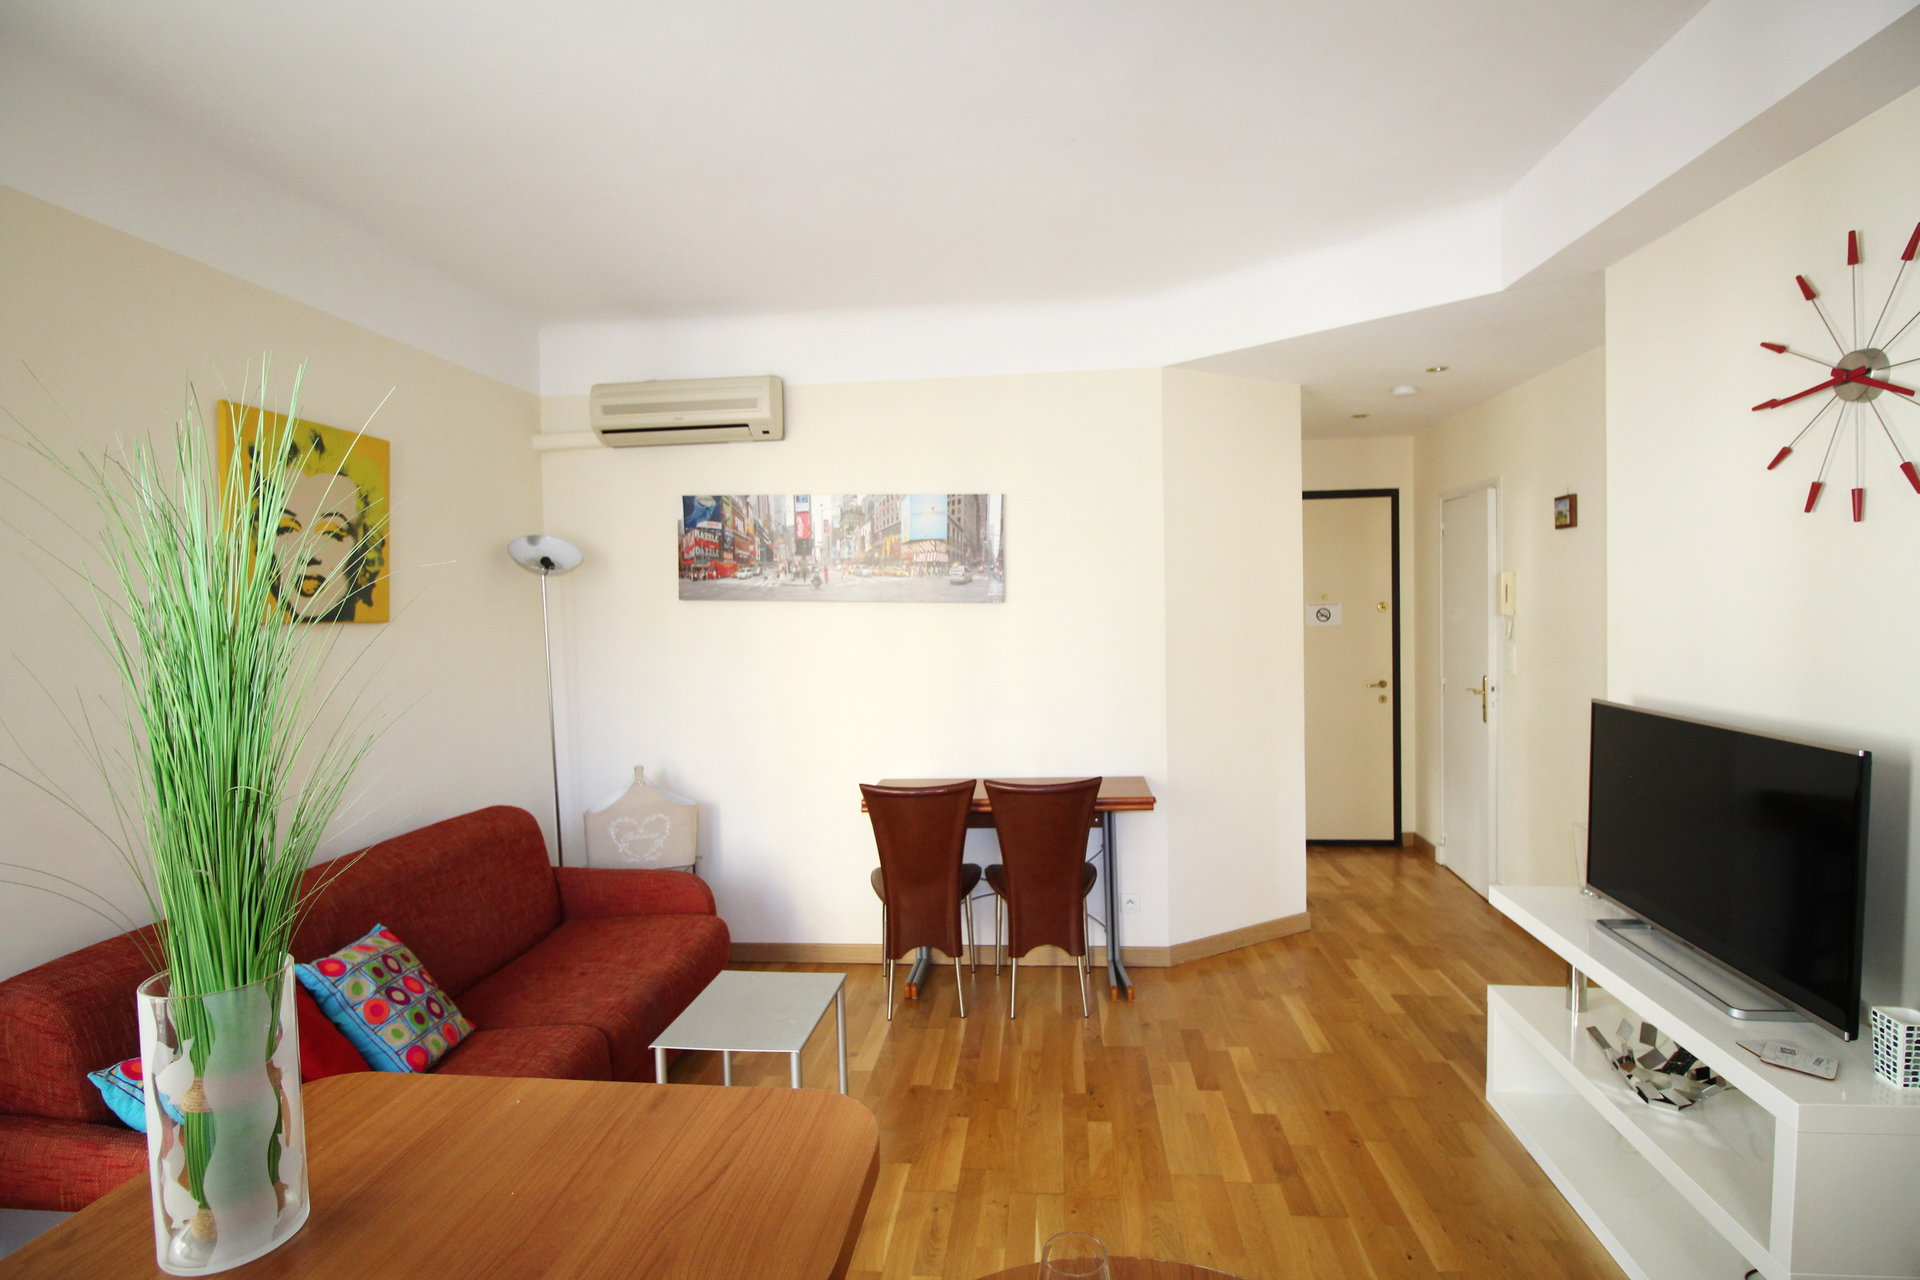 Affitto Appartamento - Nizza (Nice) Carré d'or